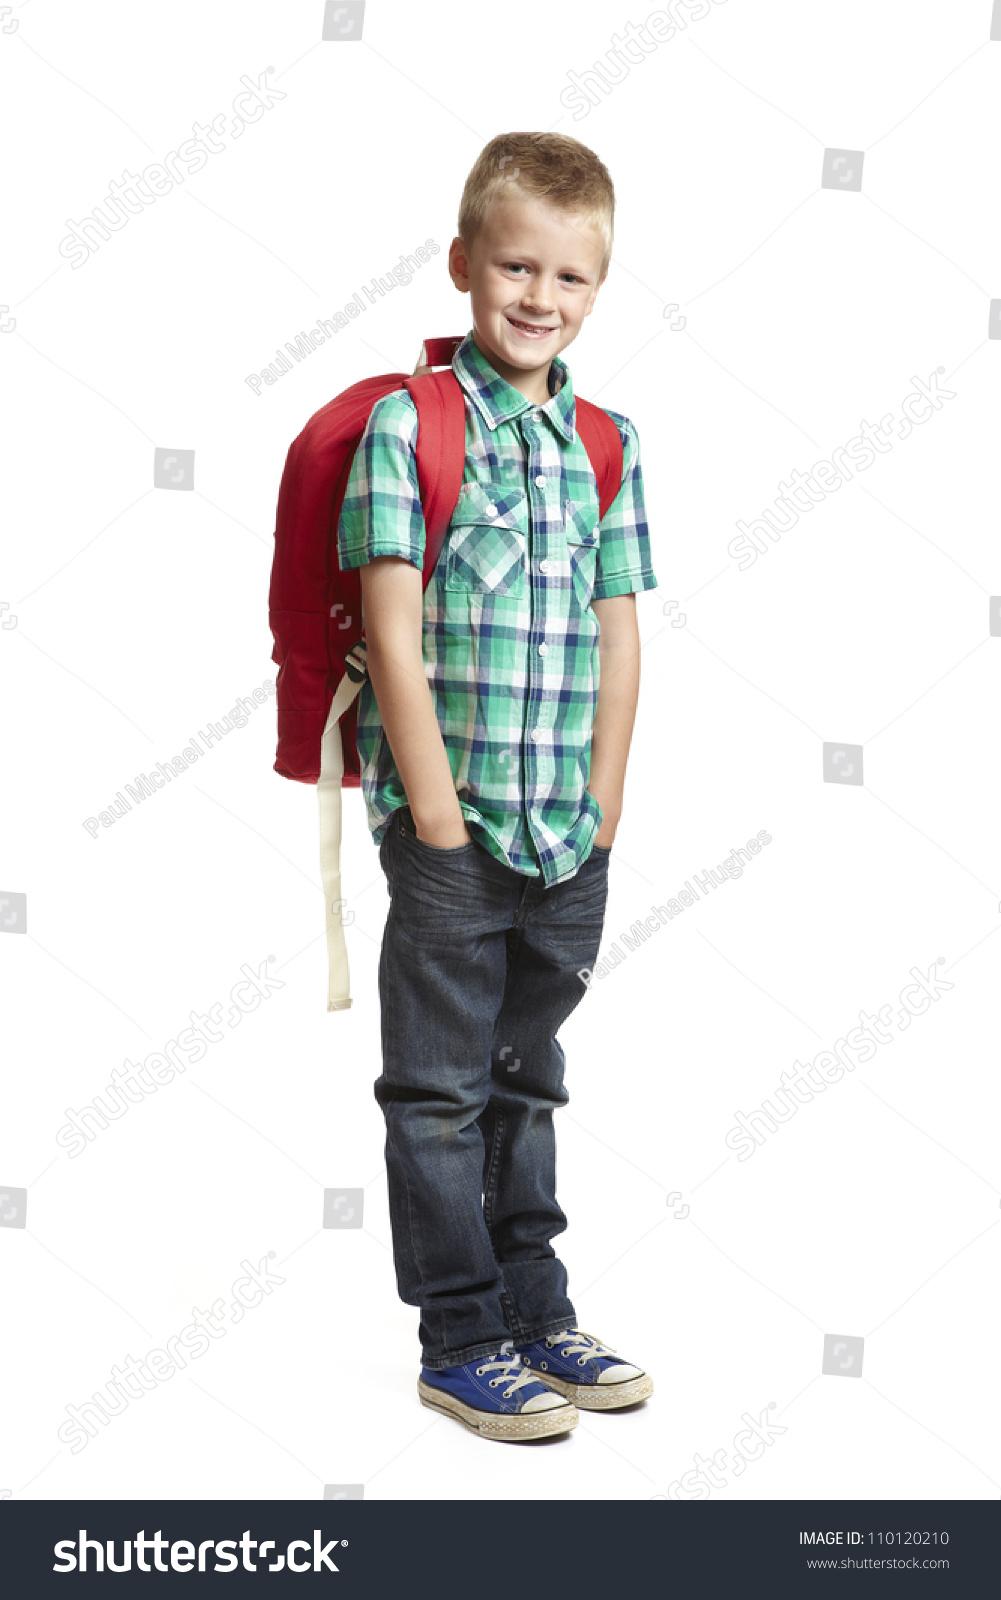 8 Year Boy Bedroom Design: 8 Year Old School Boy Backpack Stock Photo 110120210